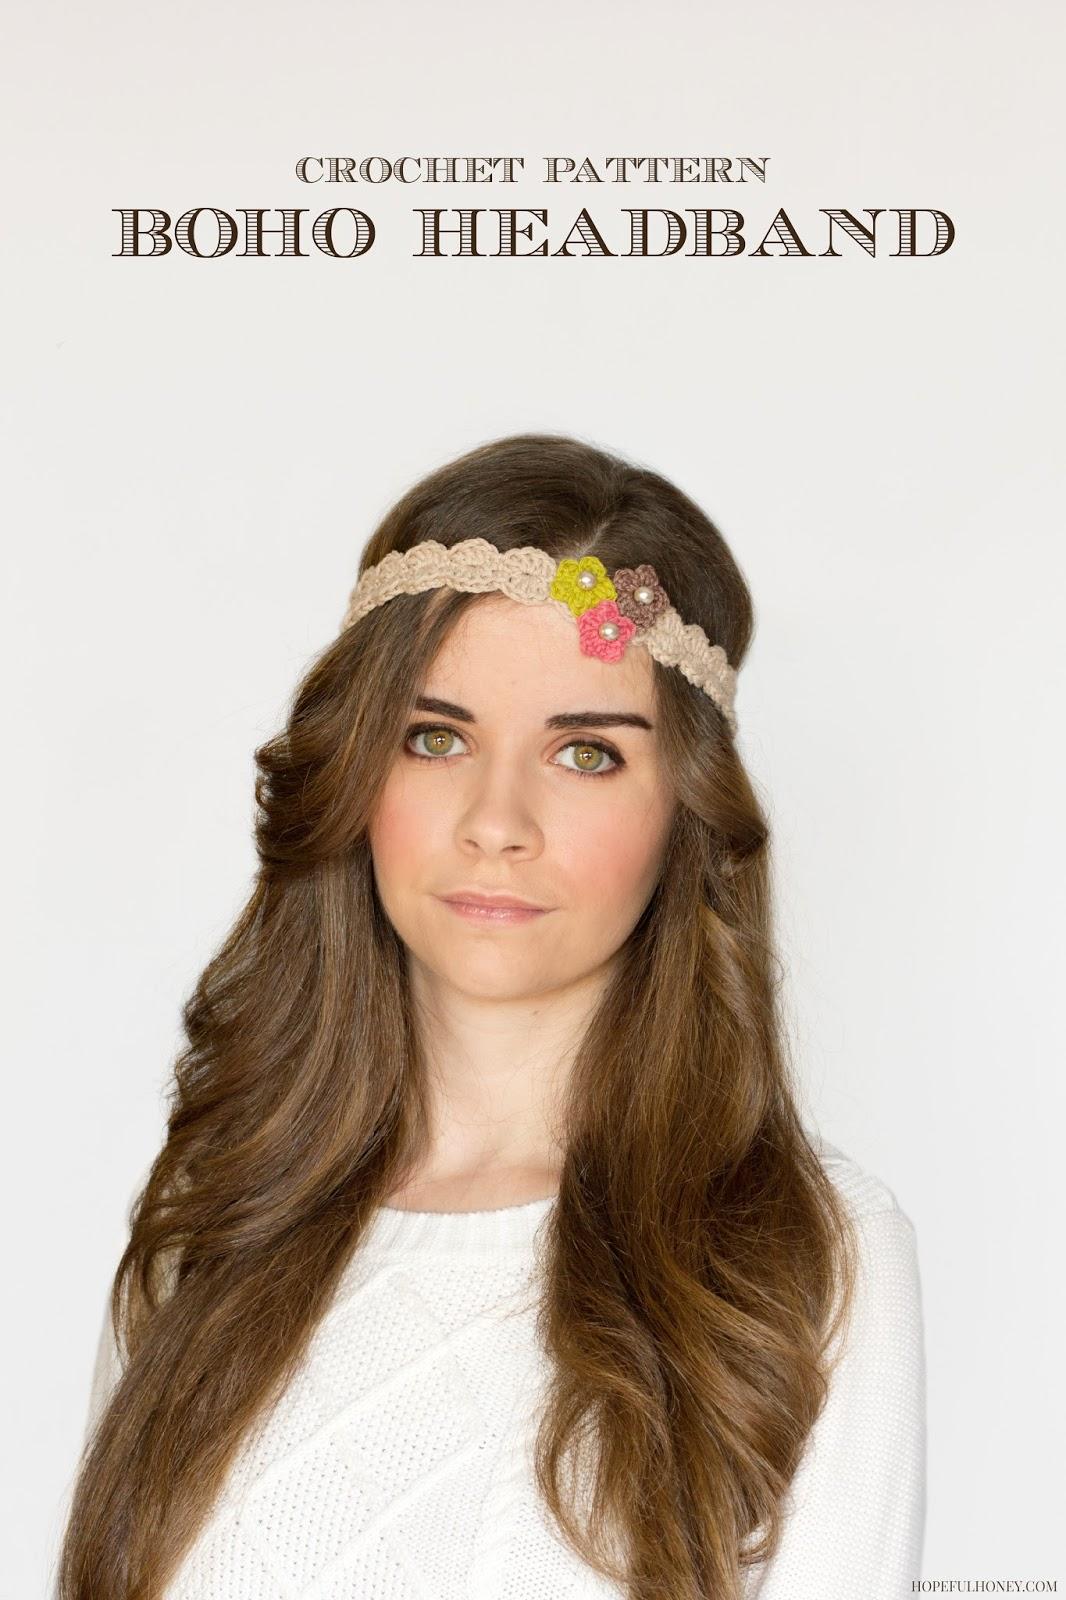 Fiber flux beautiful headbands 16 free crochet patterns bloomswirl headband from hopeful honey dt1010fo